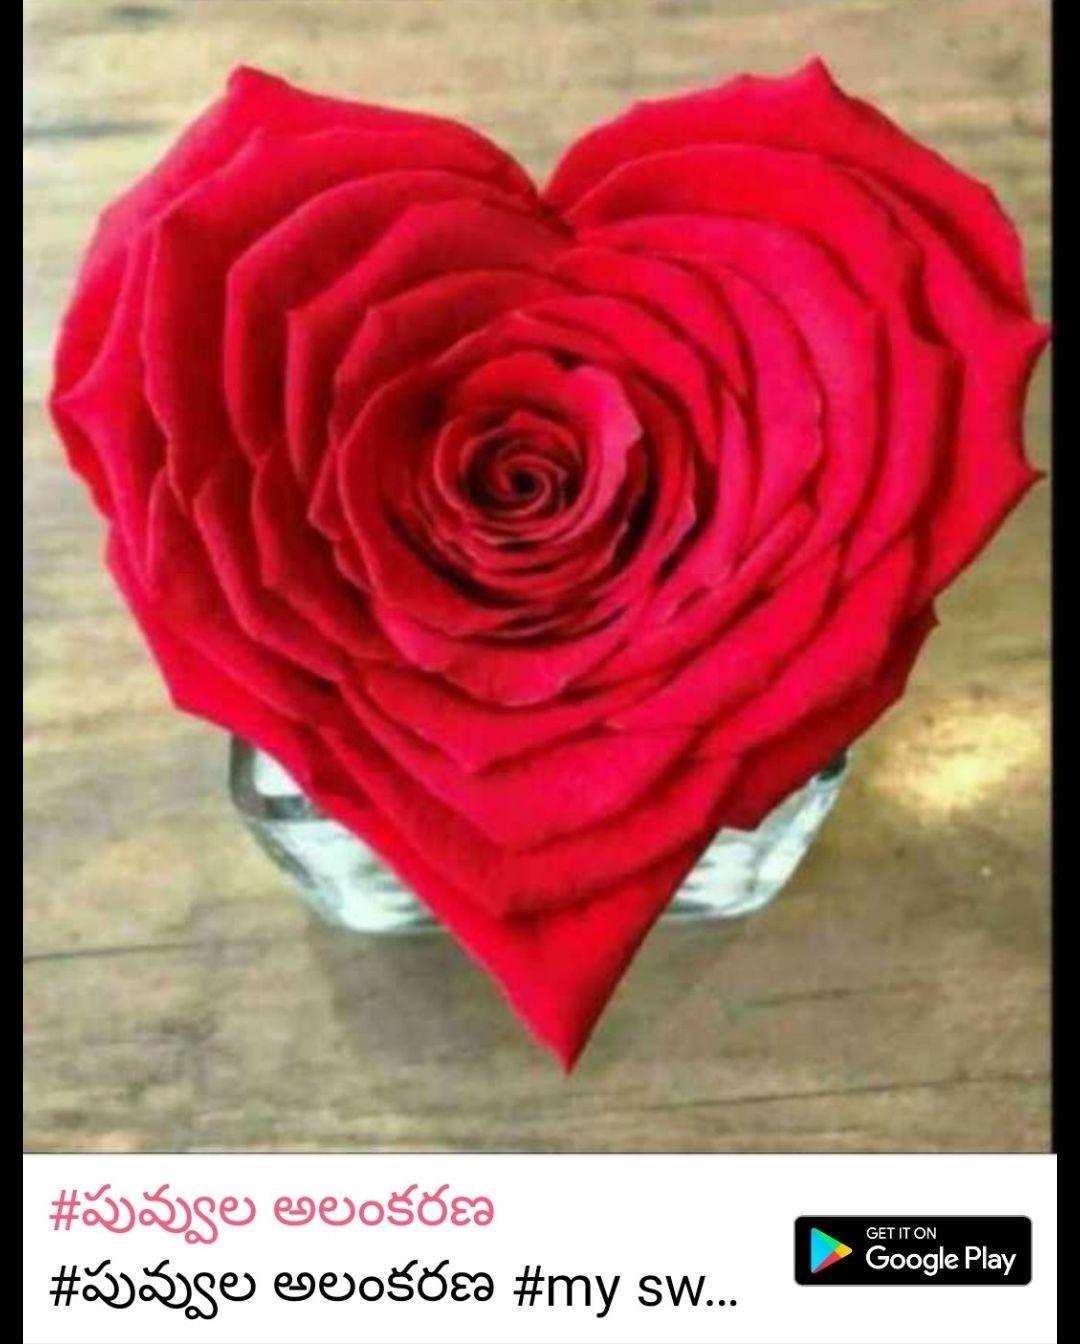 flower 🌸 - GET IT ON # పువ్వుల అలంకరణ # పువ్వుల అలంకరణ # my sw . . . Google Play - ShareChat